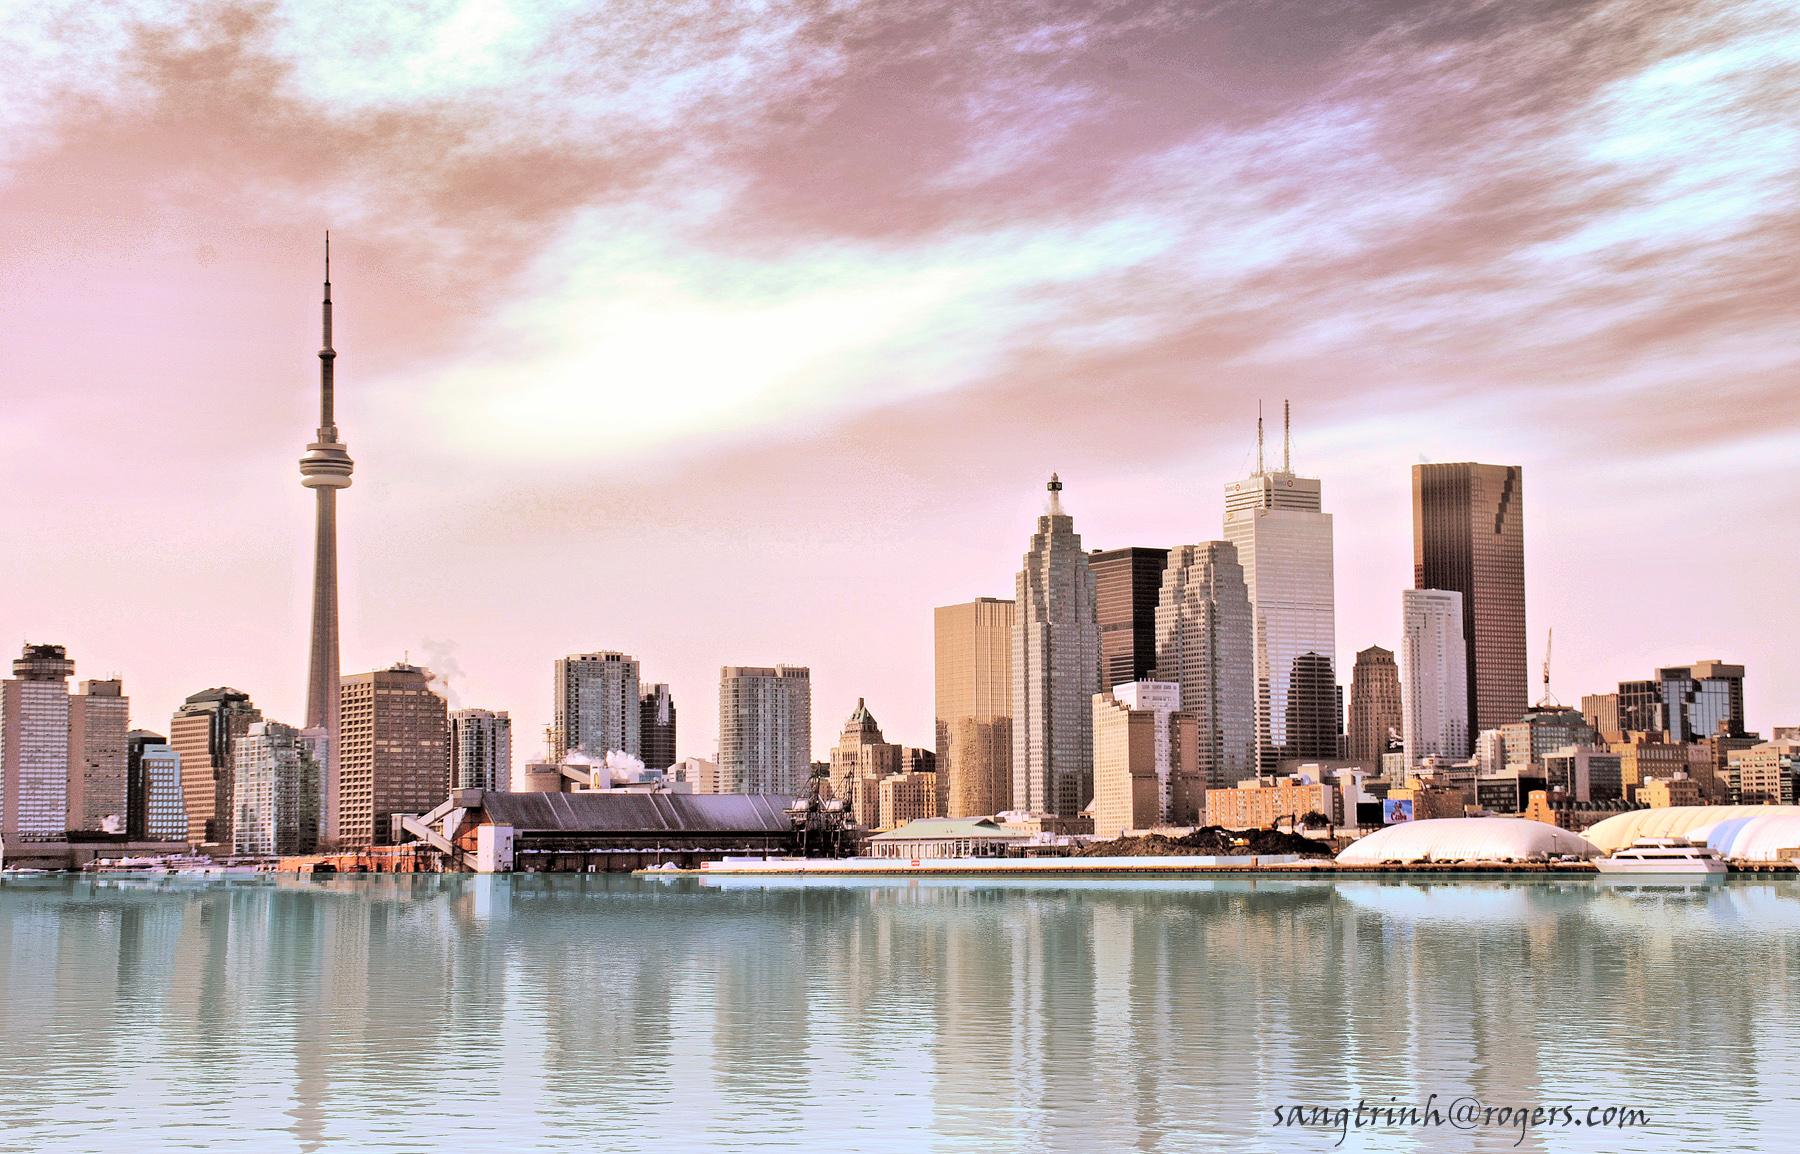 Fondos de pantalla de Canada Wallpapers de Canada Fondos de 1800x1154